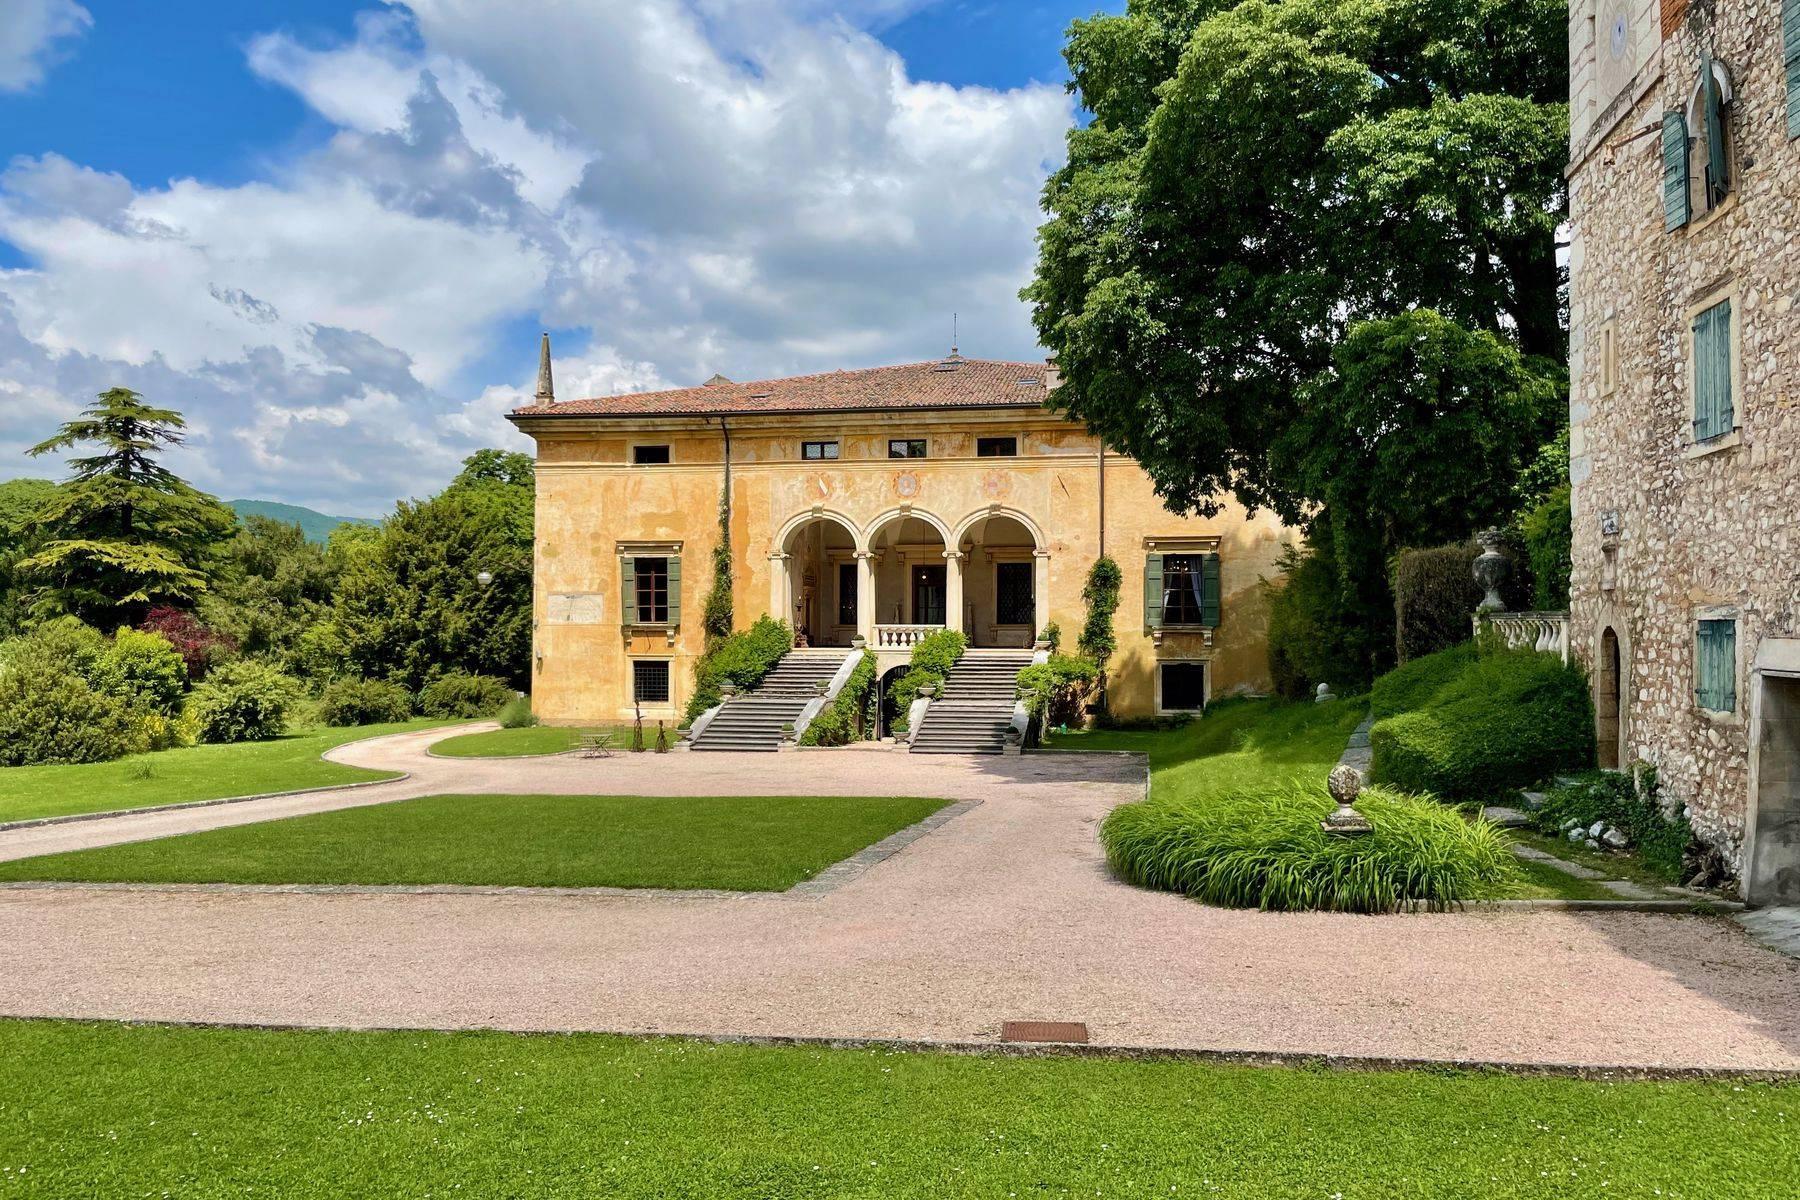 Affascinante villa Veneta a pochi minuti da Verona - 45